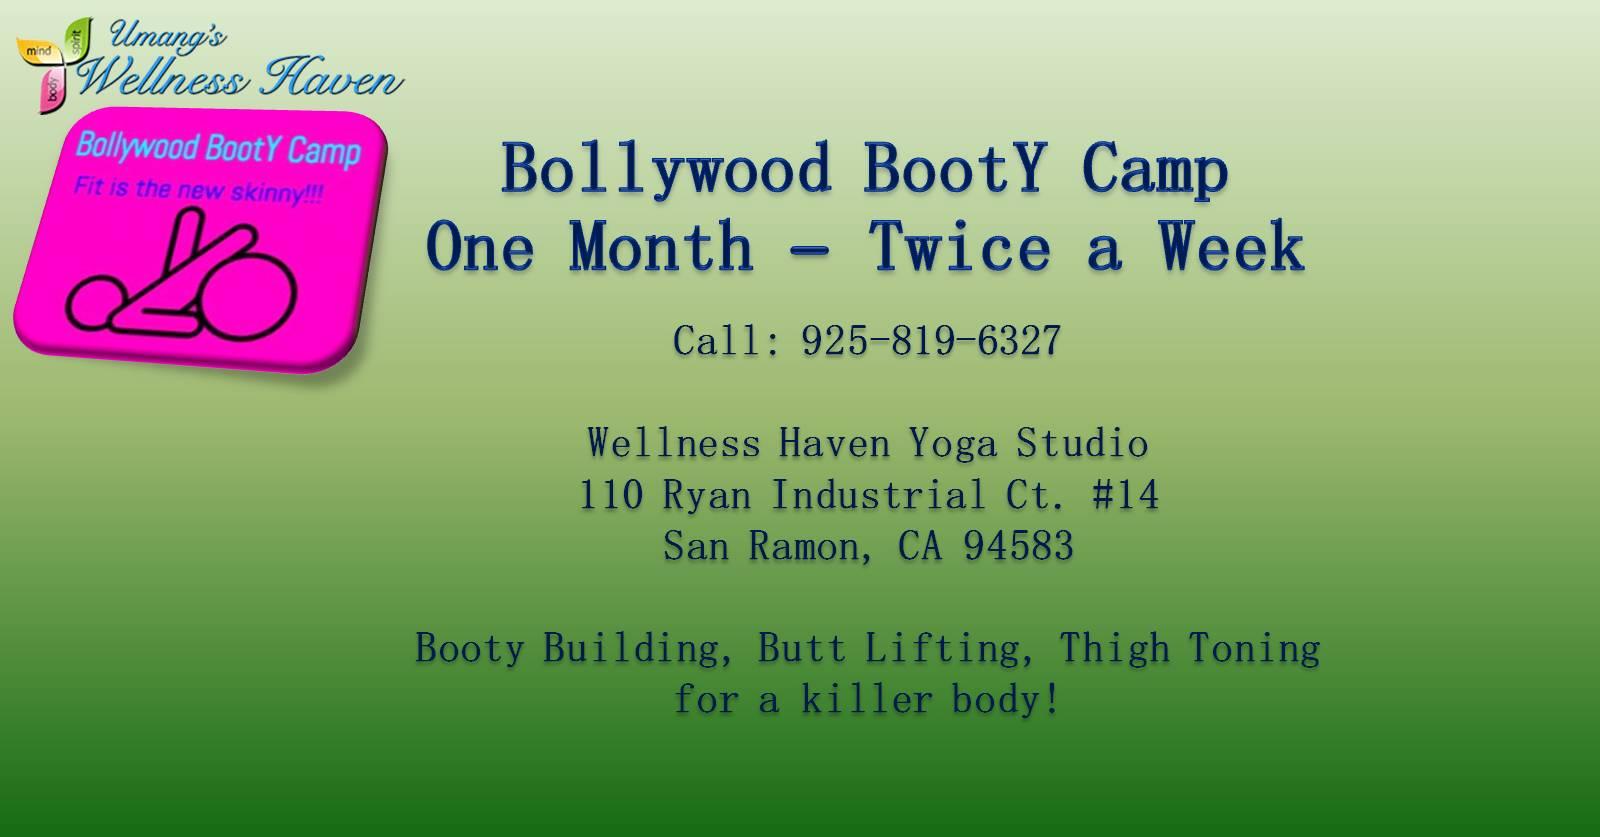 BBC - Bollywood BootY Camp